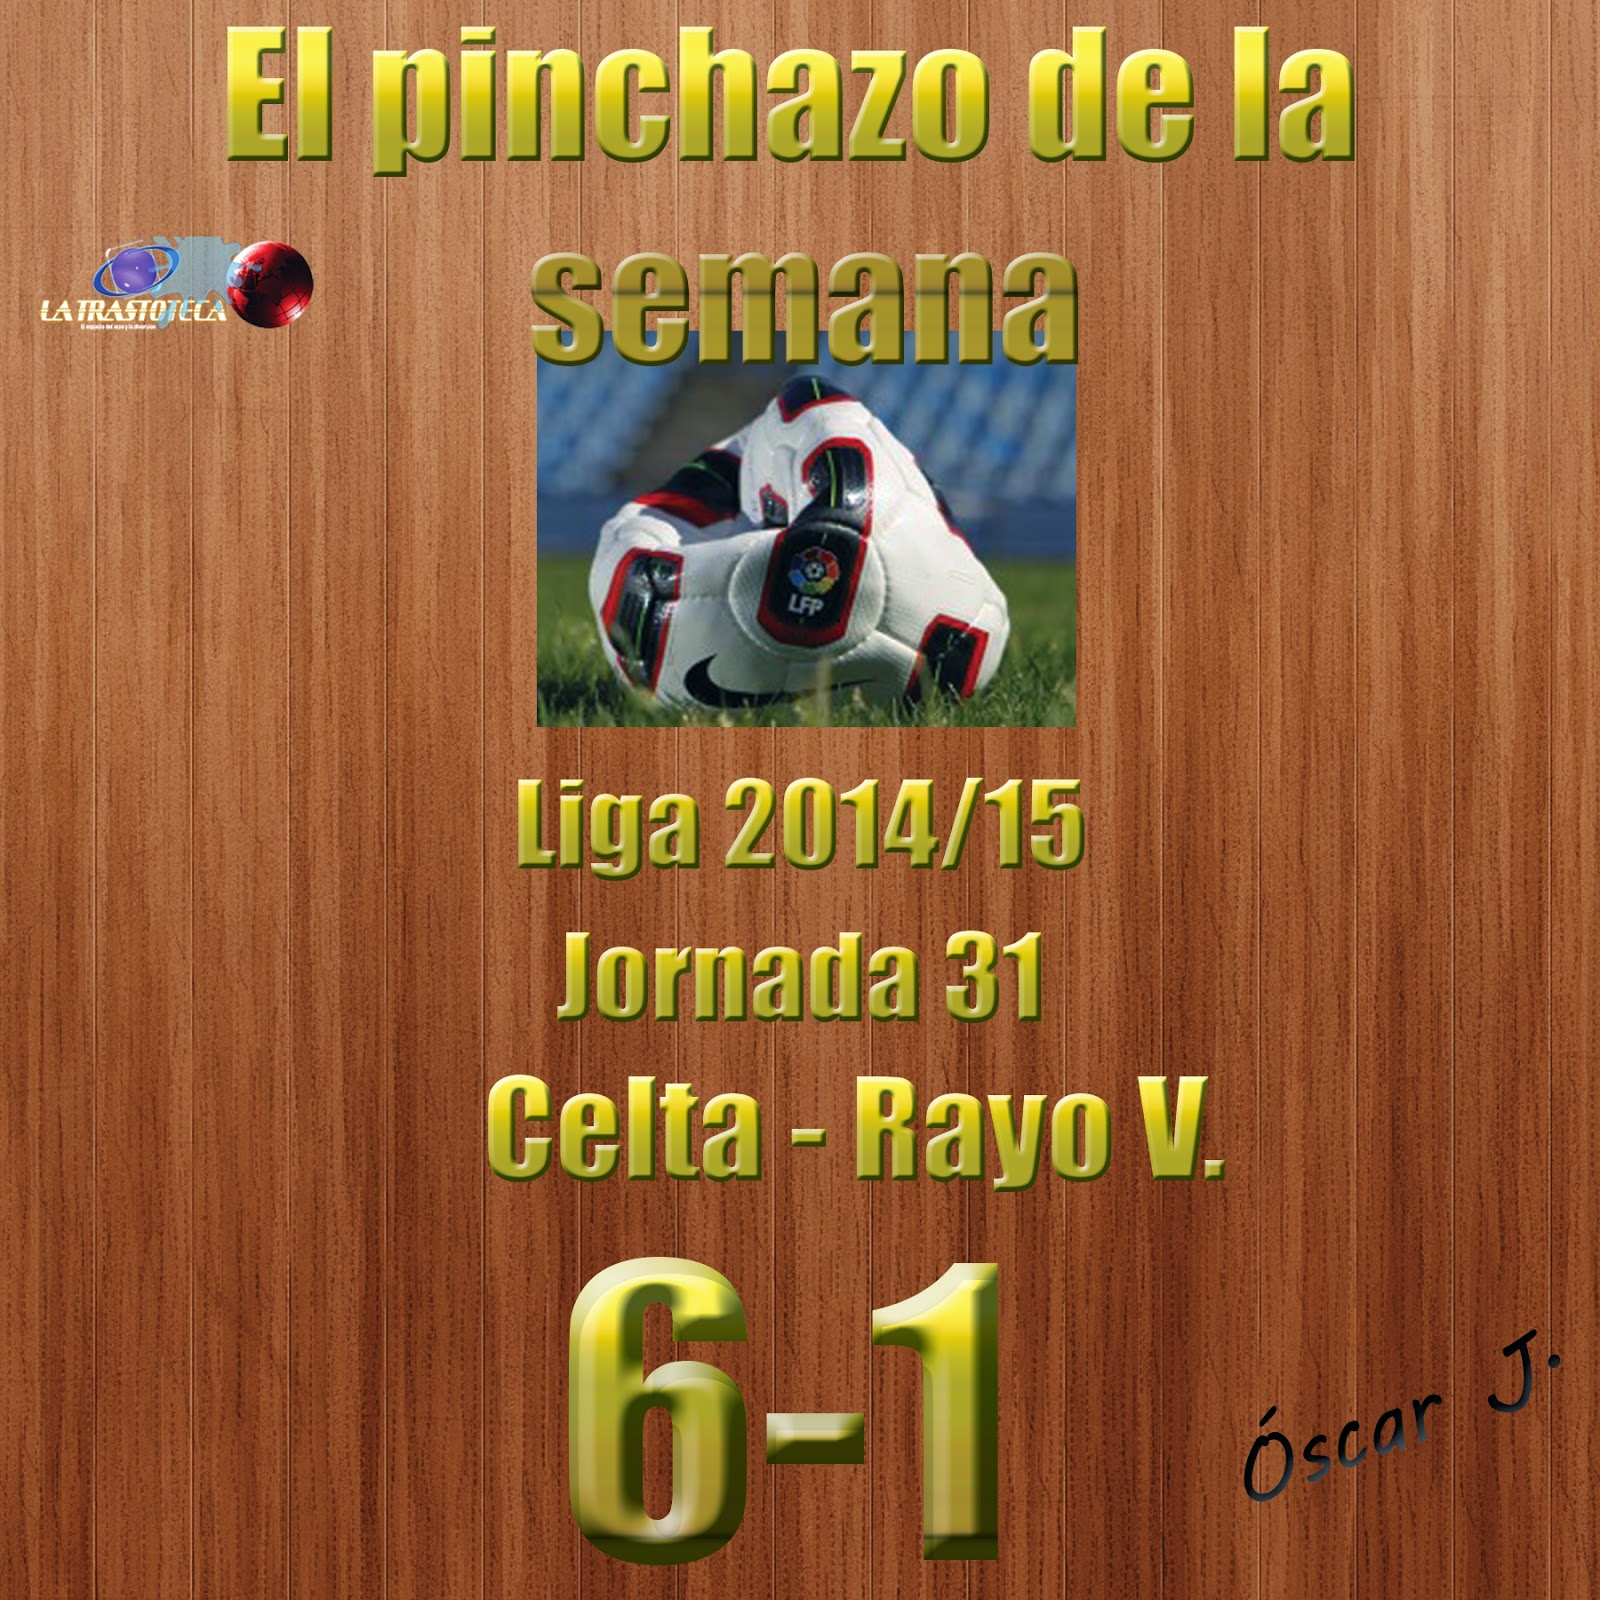 Celta 6-1 Rayo V. Liga 2014/15. Jornada 31. El pinchazo de la semana.